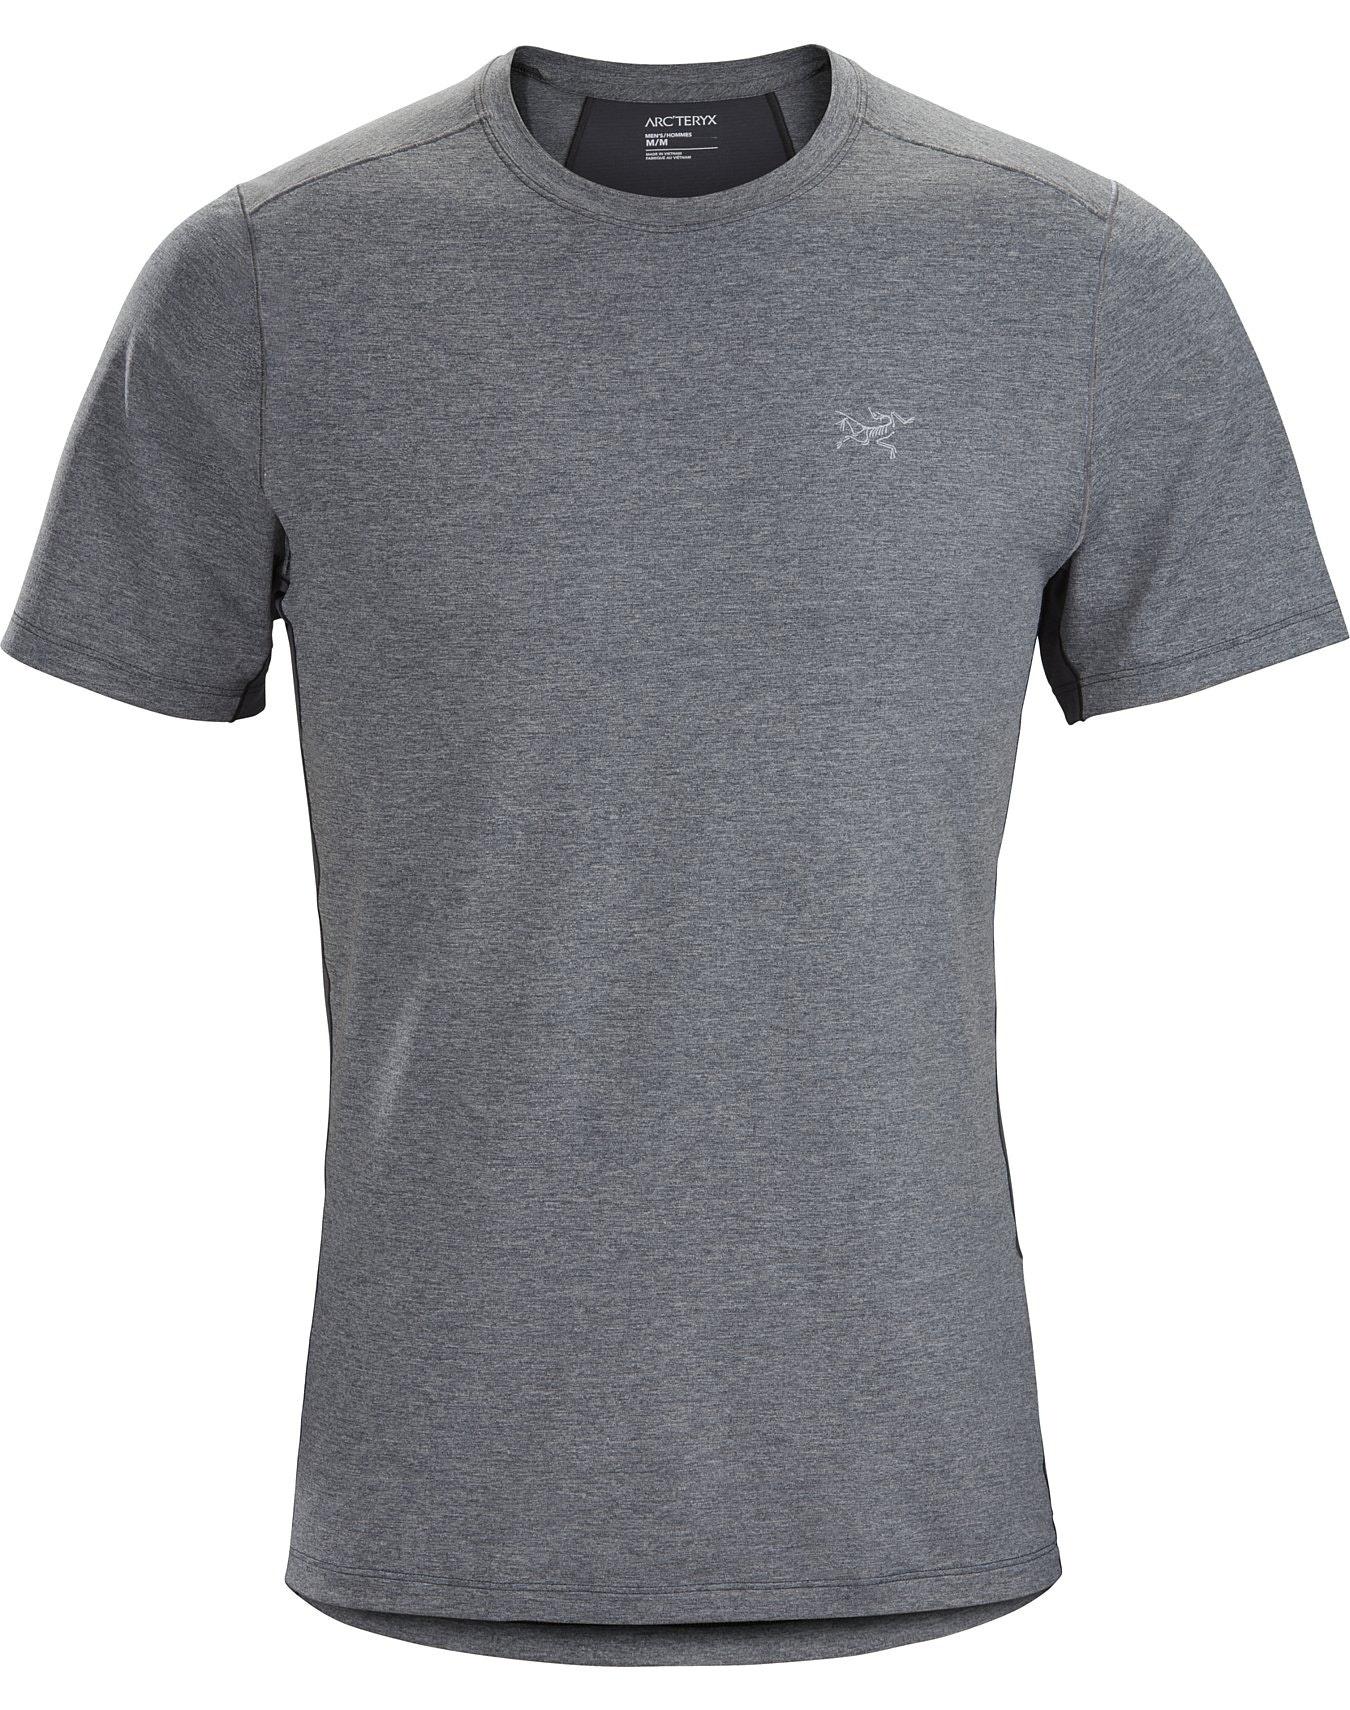 Arc'teryx LEAF Arc'teryx LEAF Cormac Comp Shirt SS Men's